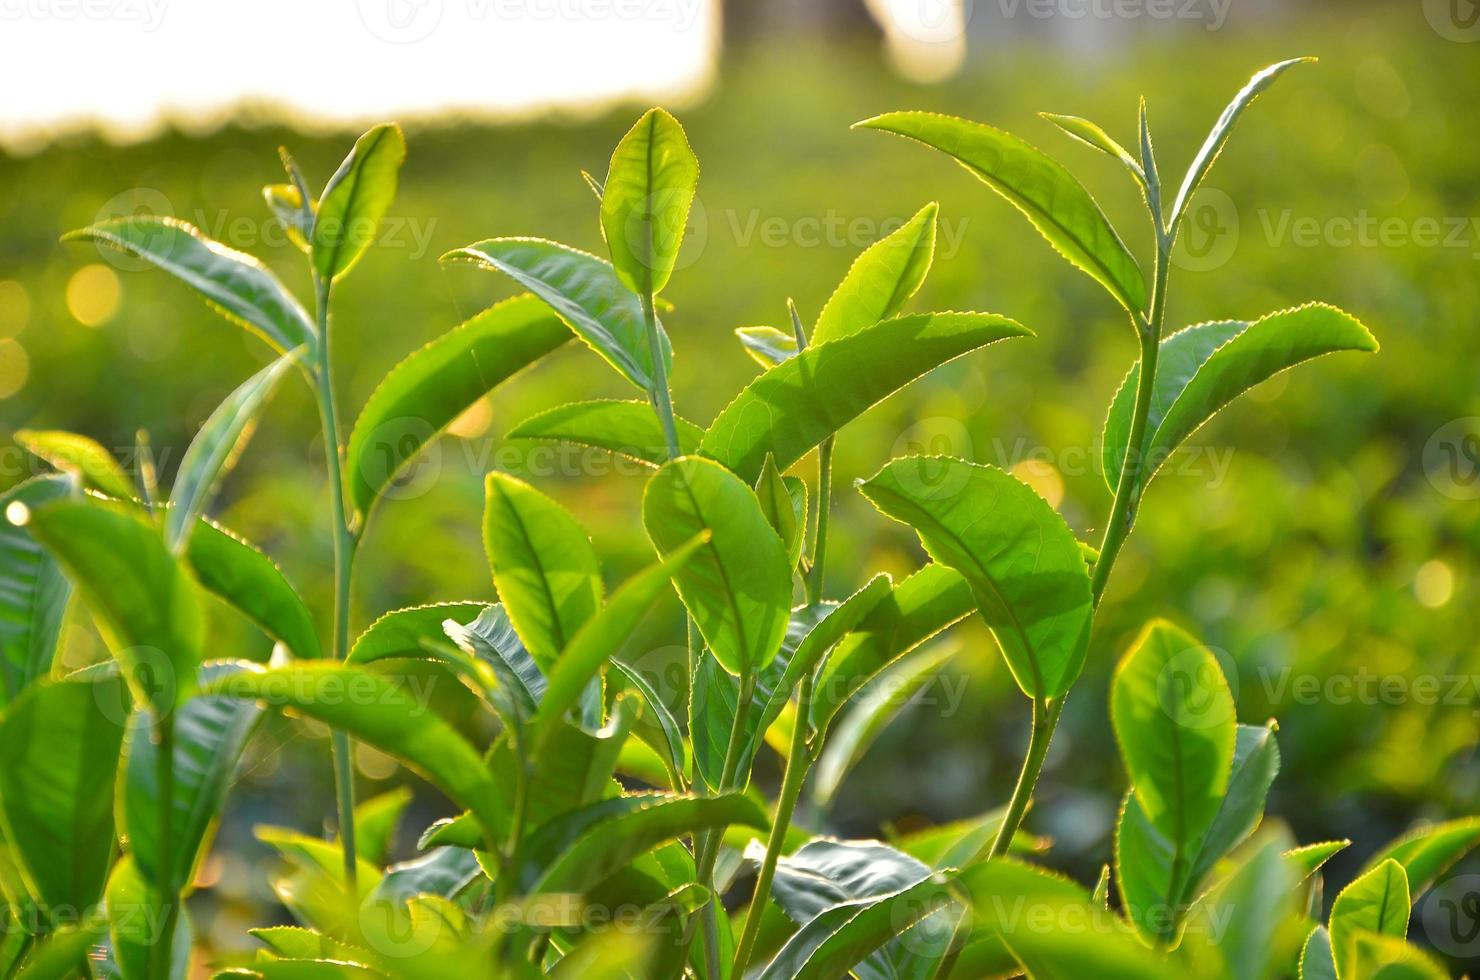 Teeplantagenblätter foto